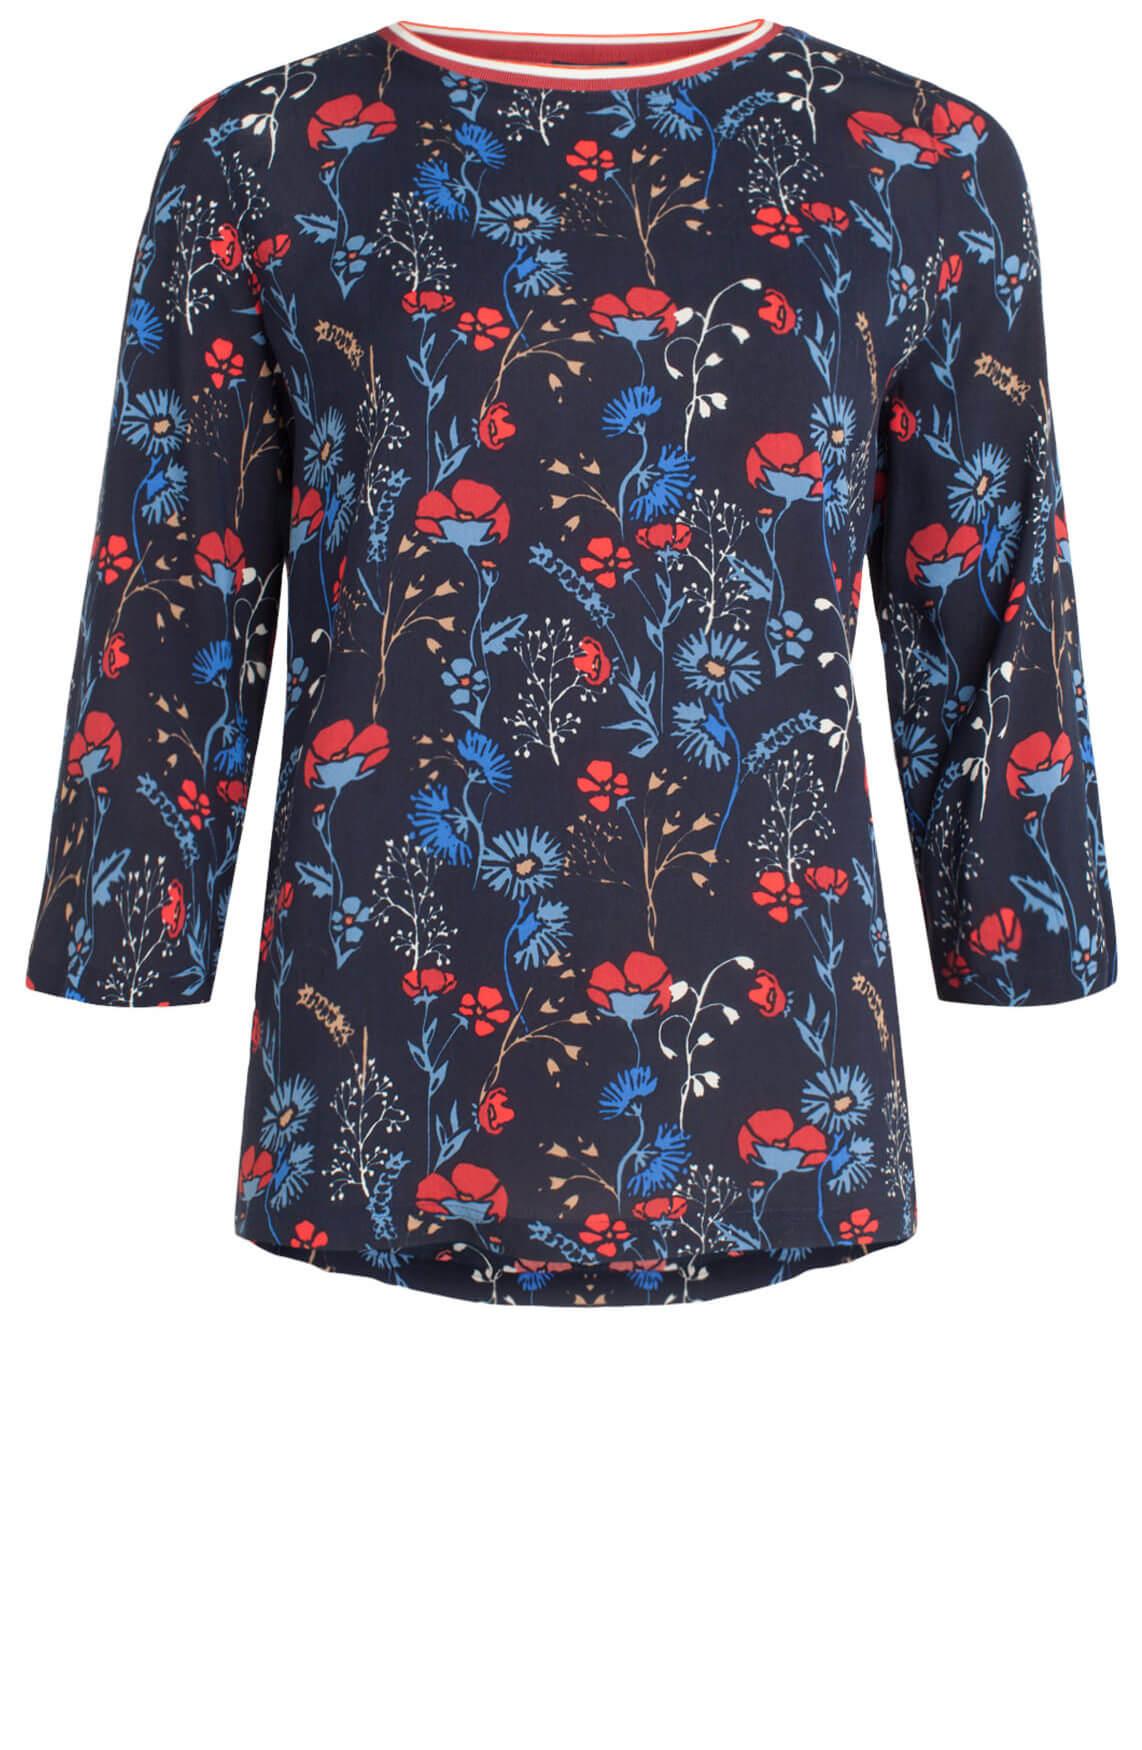 Marc O'Polo Dames Blouse met bloemenprint Blauw